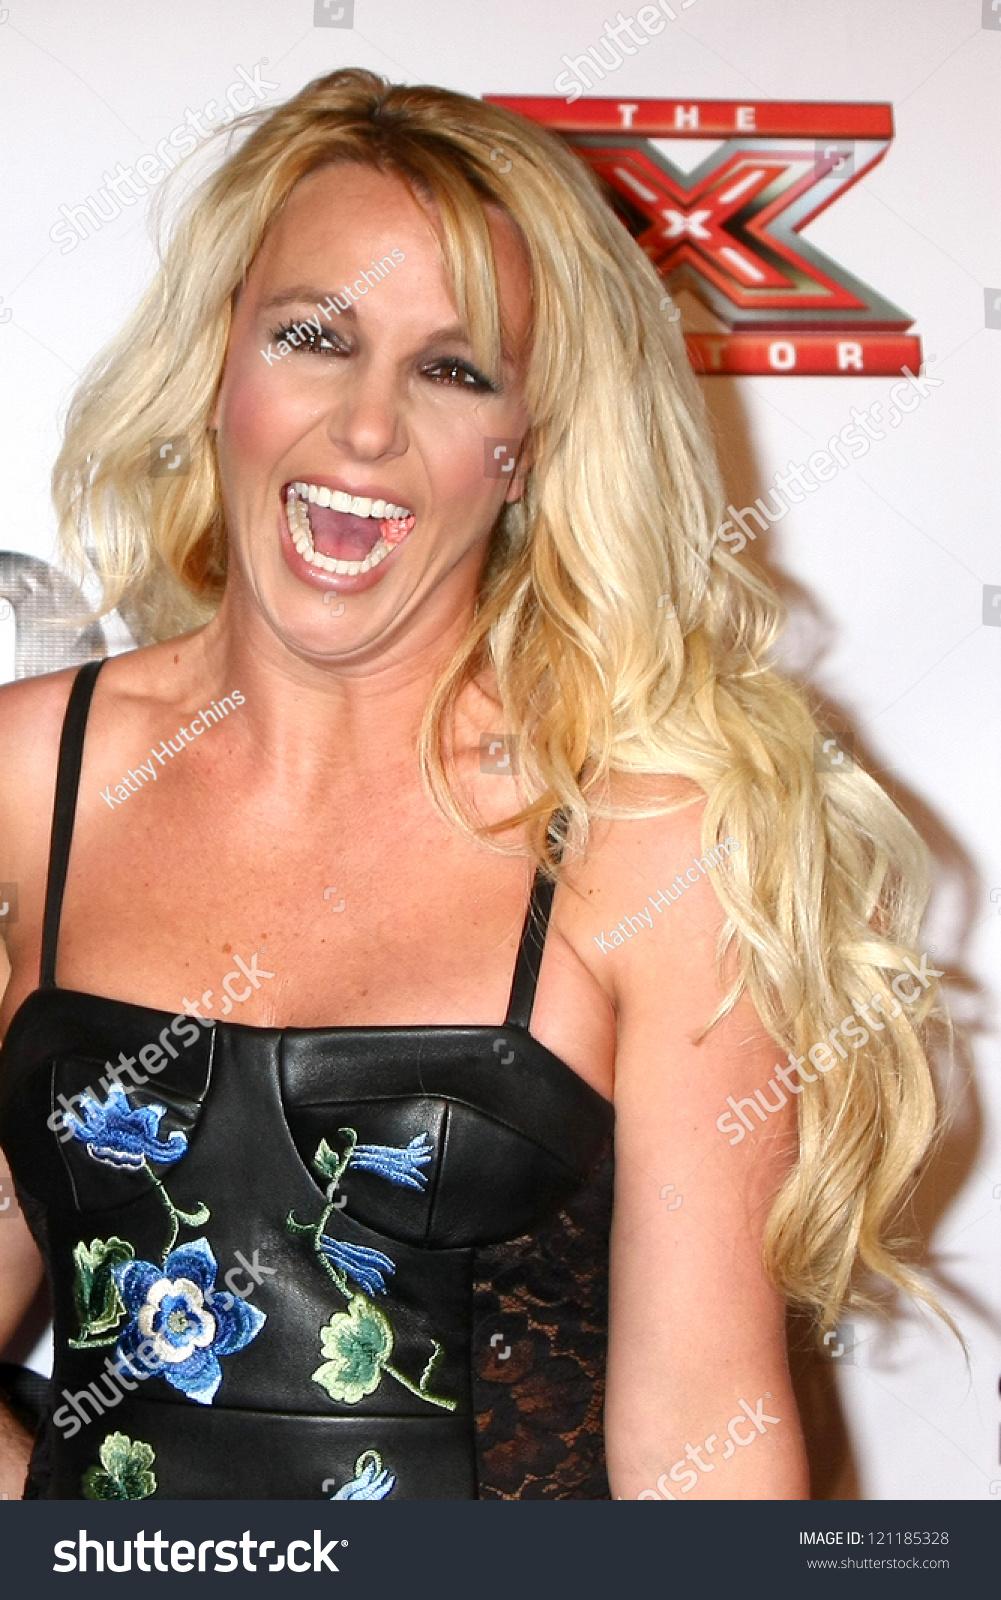 Watch 6. Britney Spears video